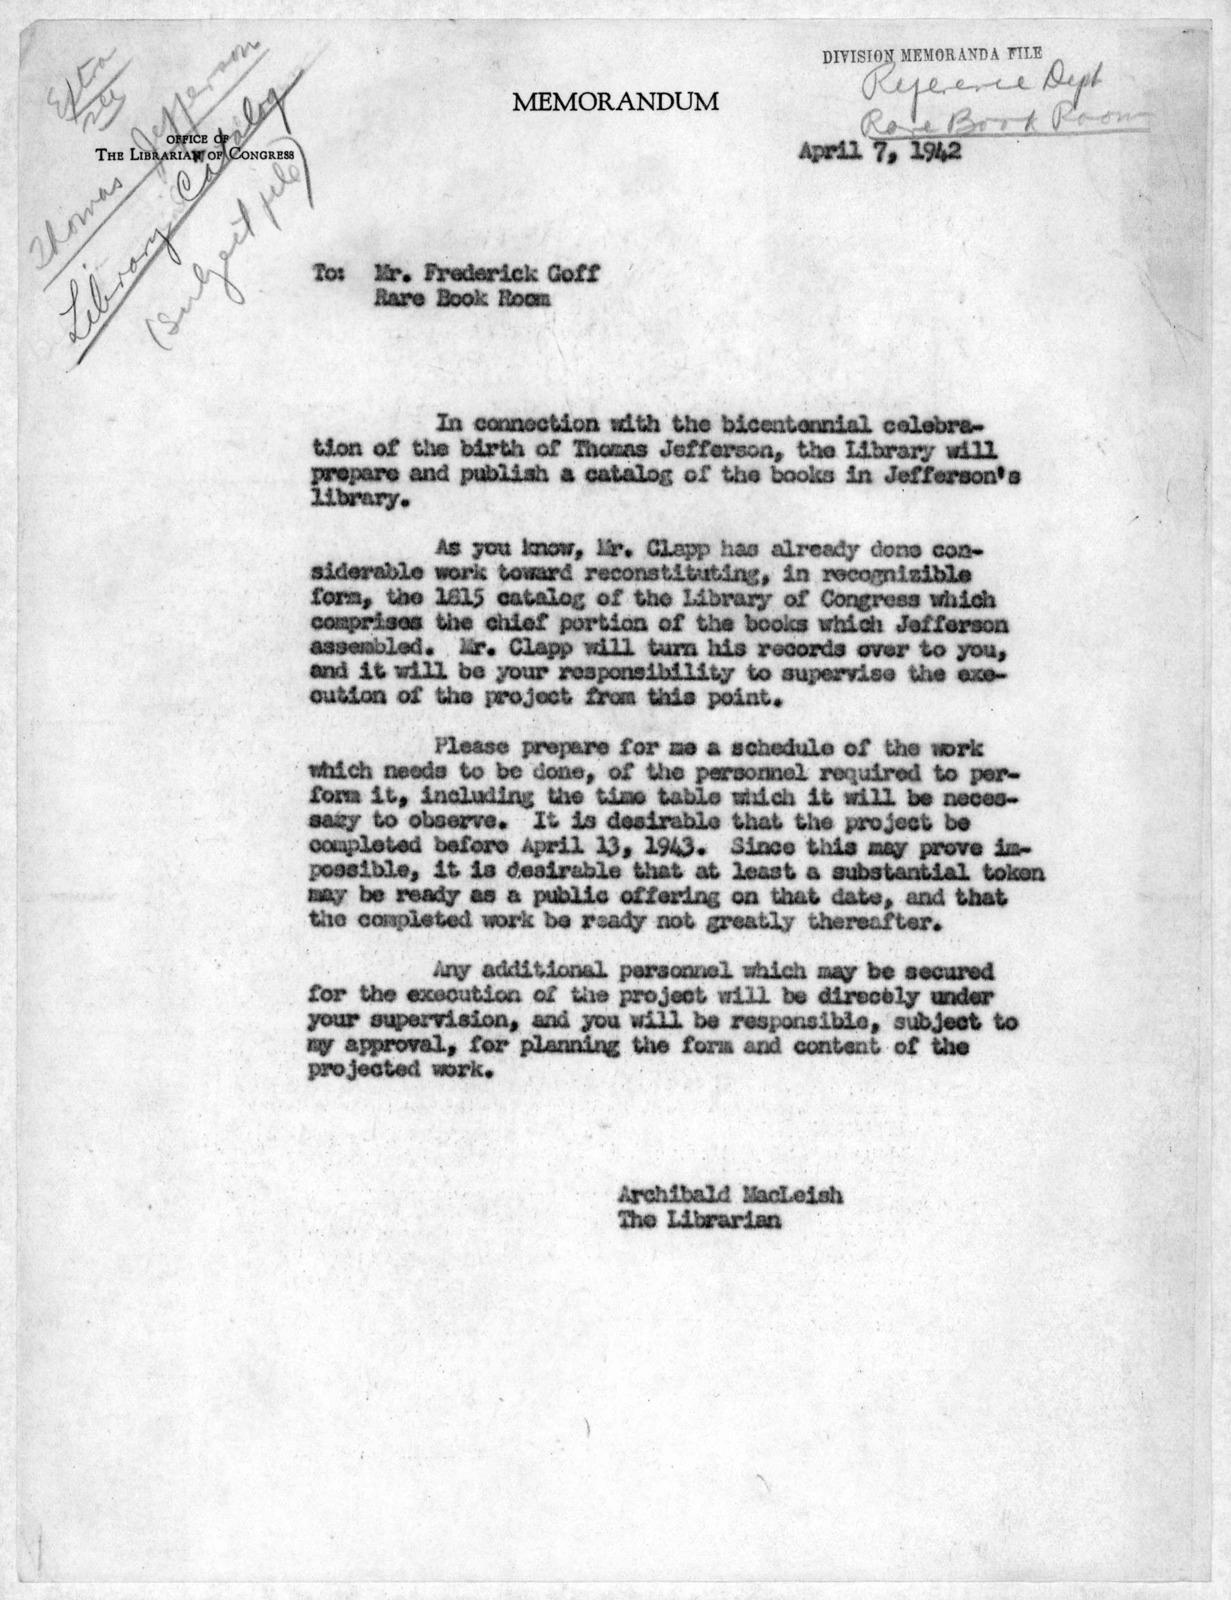 Memorandum from Archibald MacLeish to Frederick Goff, April 7, 1942